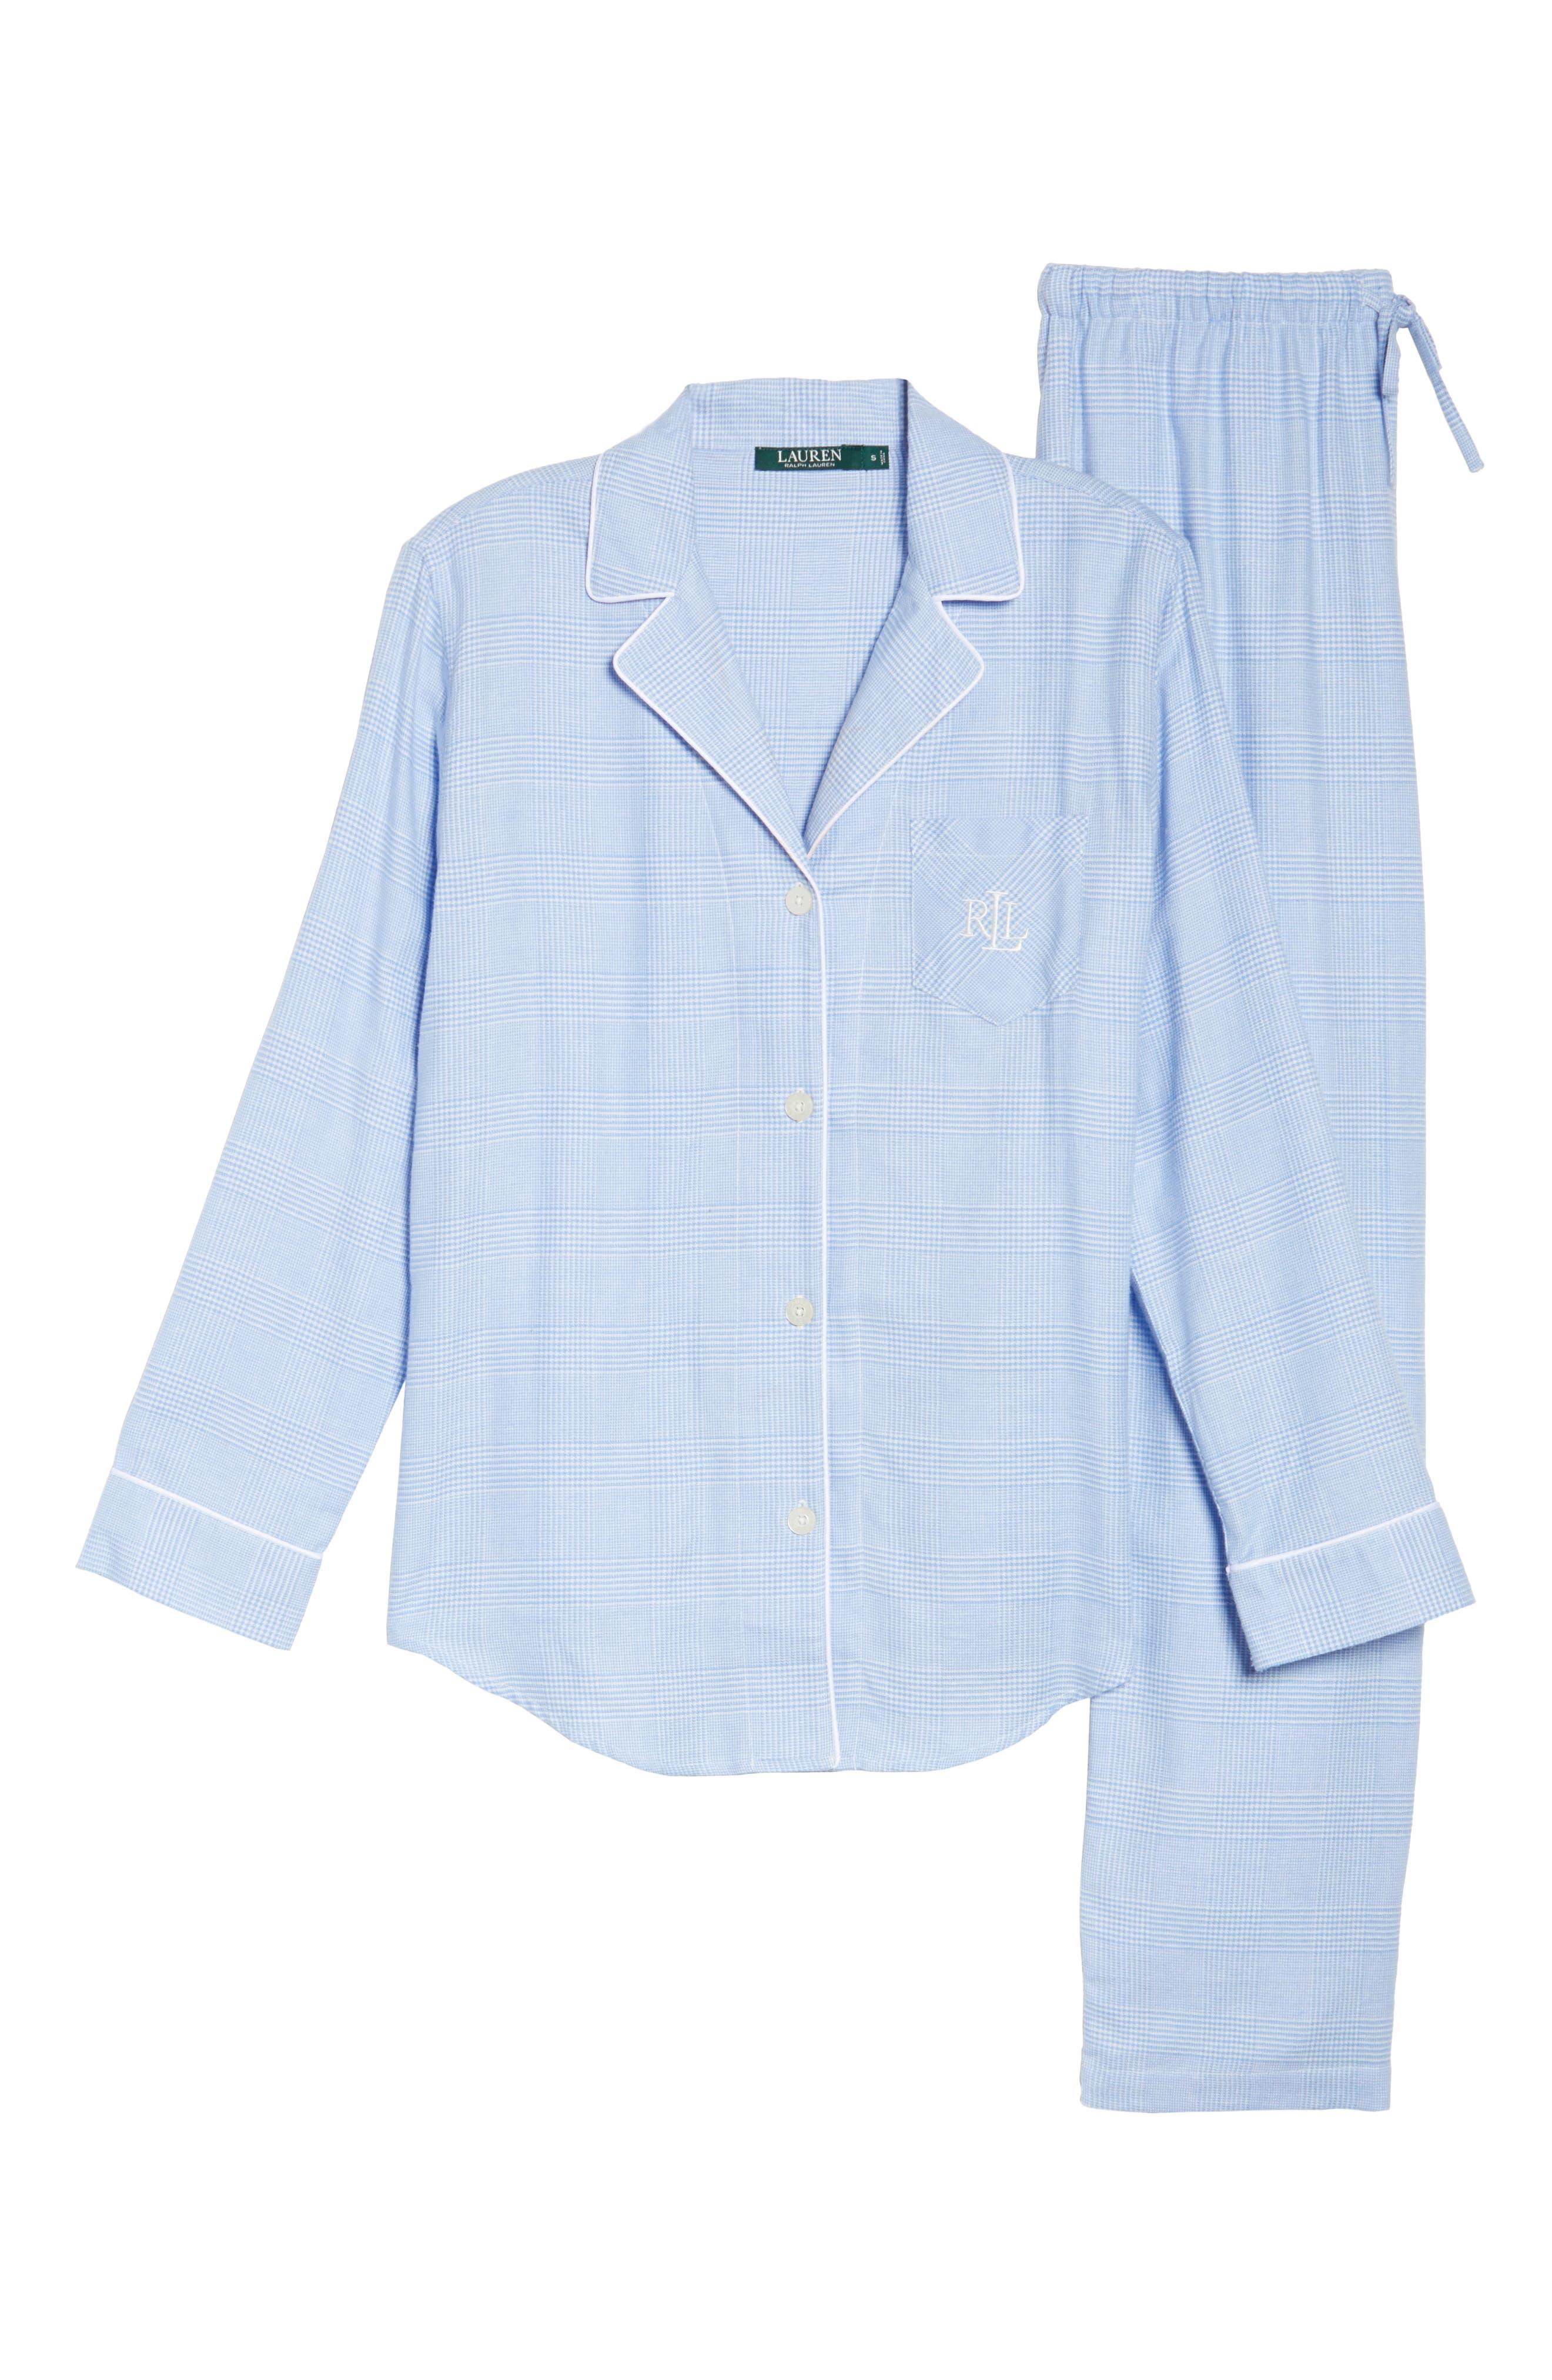 Long Pajamas,                             Alternate thumbnail 6, color,                             410